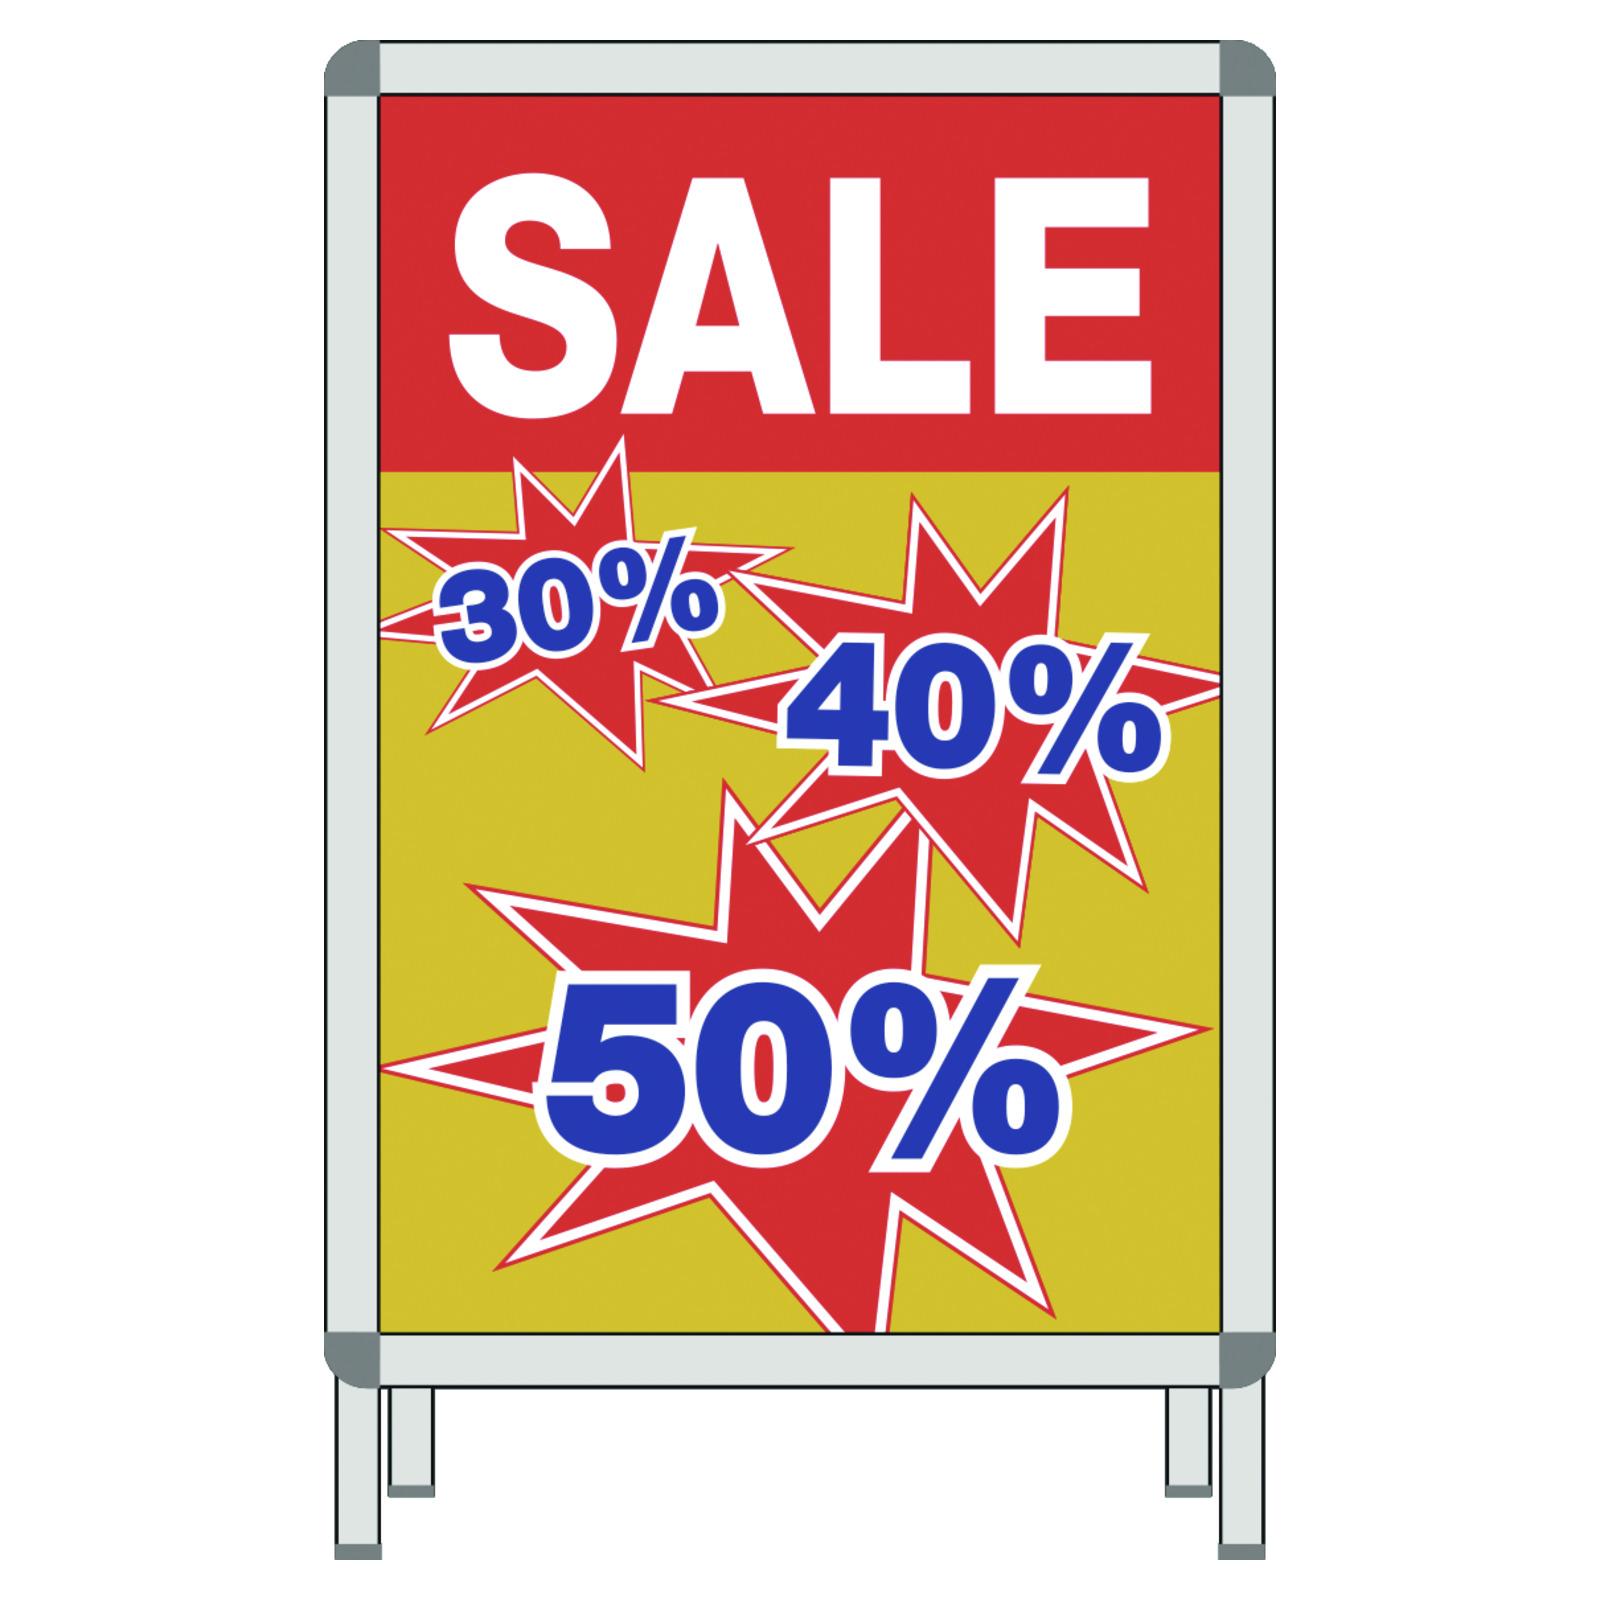 97c58d7b0f7b45 Plakat SALE 30% 40% 50% - Plakate DIN Format Räumungsverkauf   SALE ...